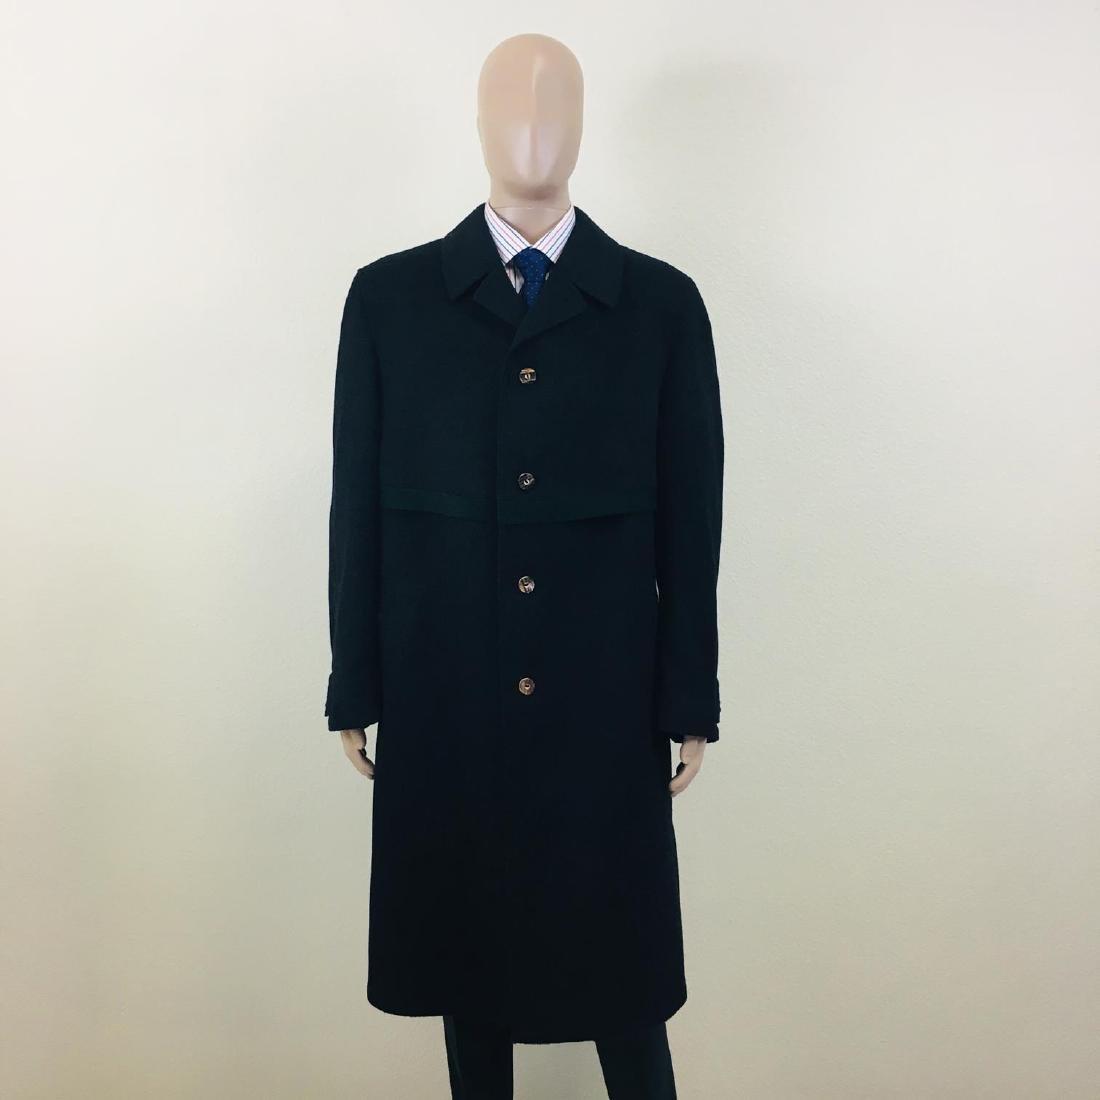 Men's LODENFREY German Designer Wool Blend Coat